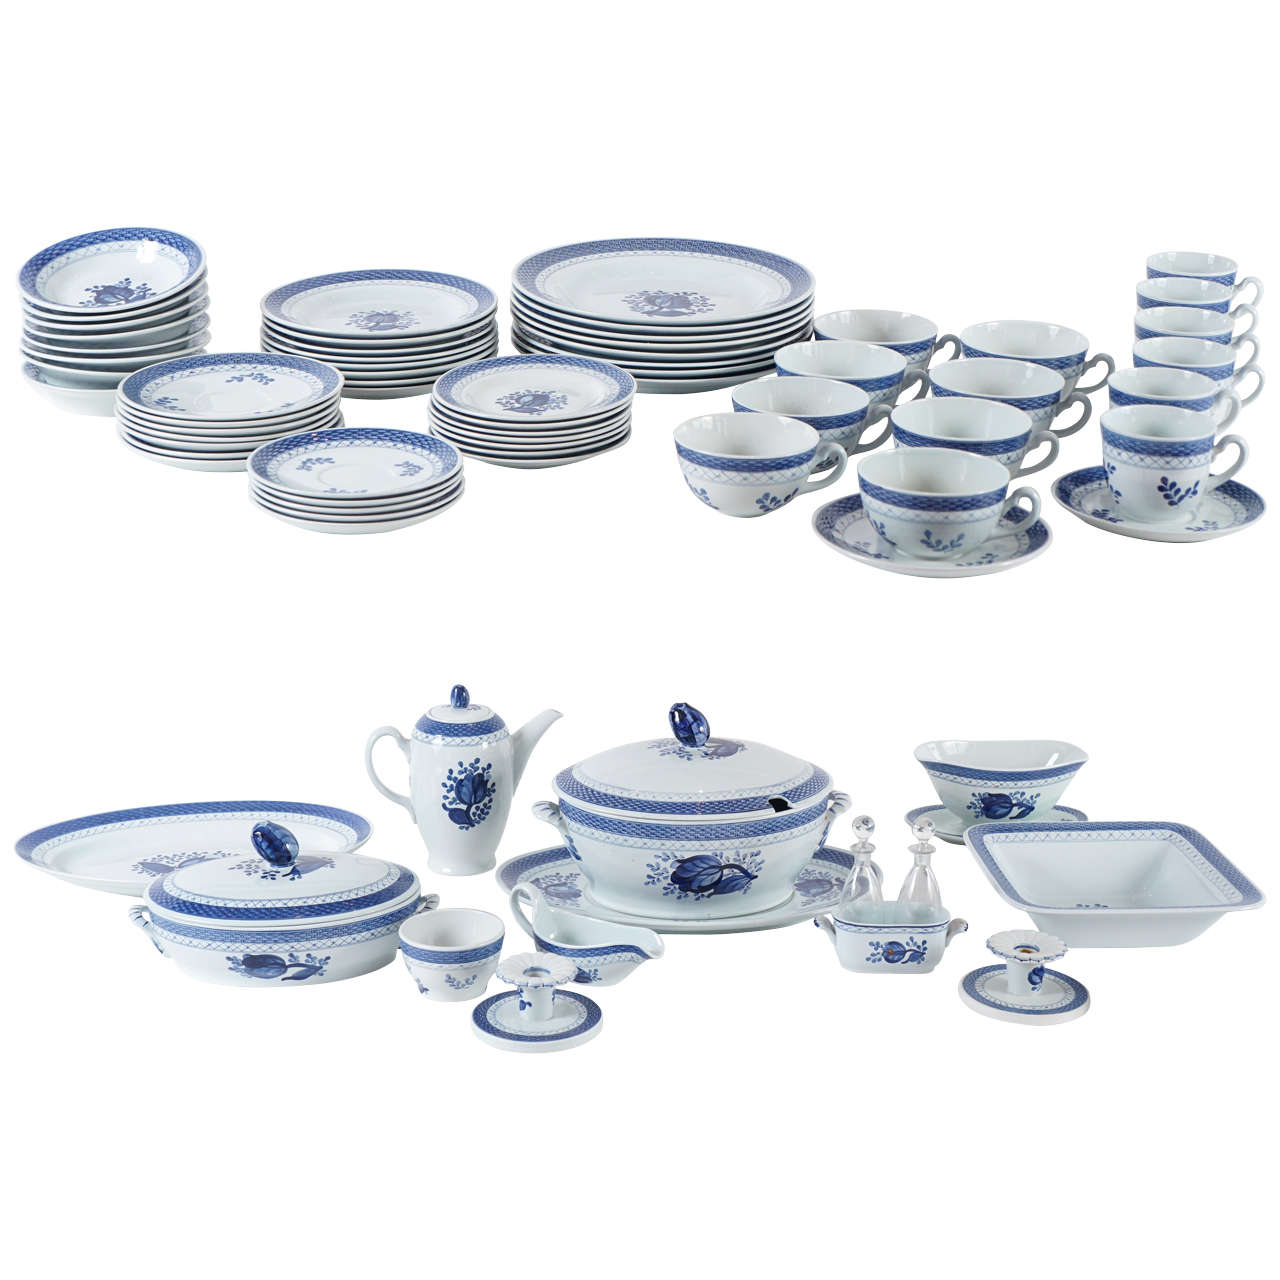 royal copenhagen dinnerware service purchased at georg jensen nyc. Black Bedroom Furniture Sets. Home Design Ideas